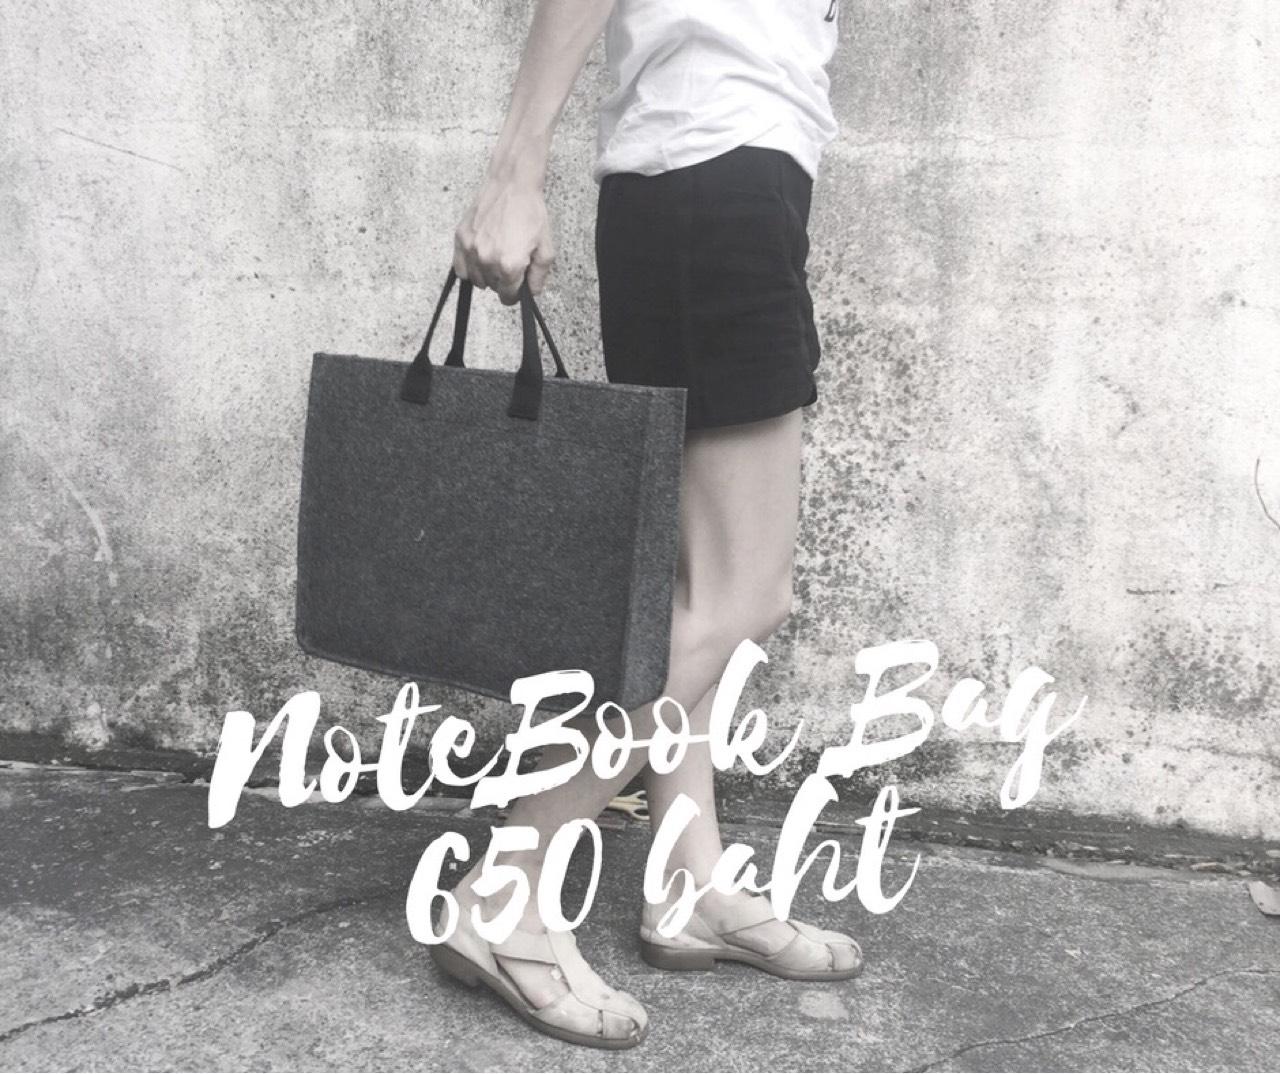 Notebook,laptop,bag,laptopbag,notebookbag,lapindesigns,กระเป๋า,ถ่ายจากสินค้าจริง,แข็งแรง,ipad,LapinDesigns